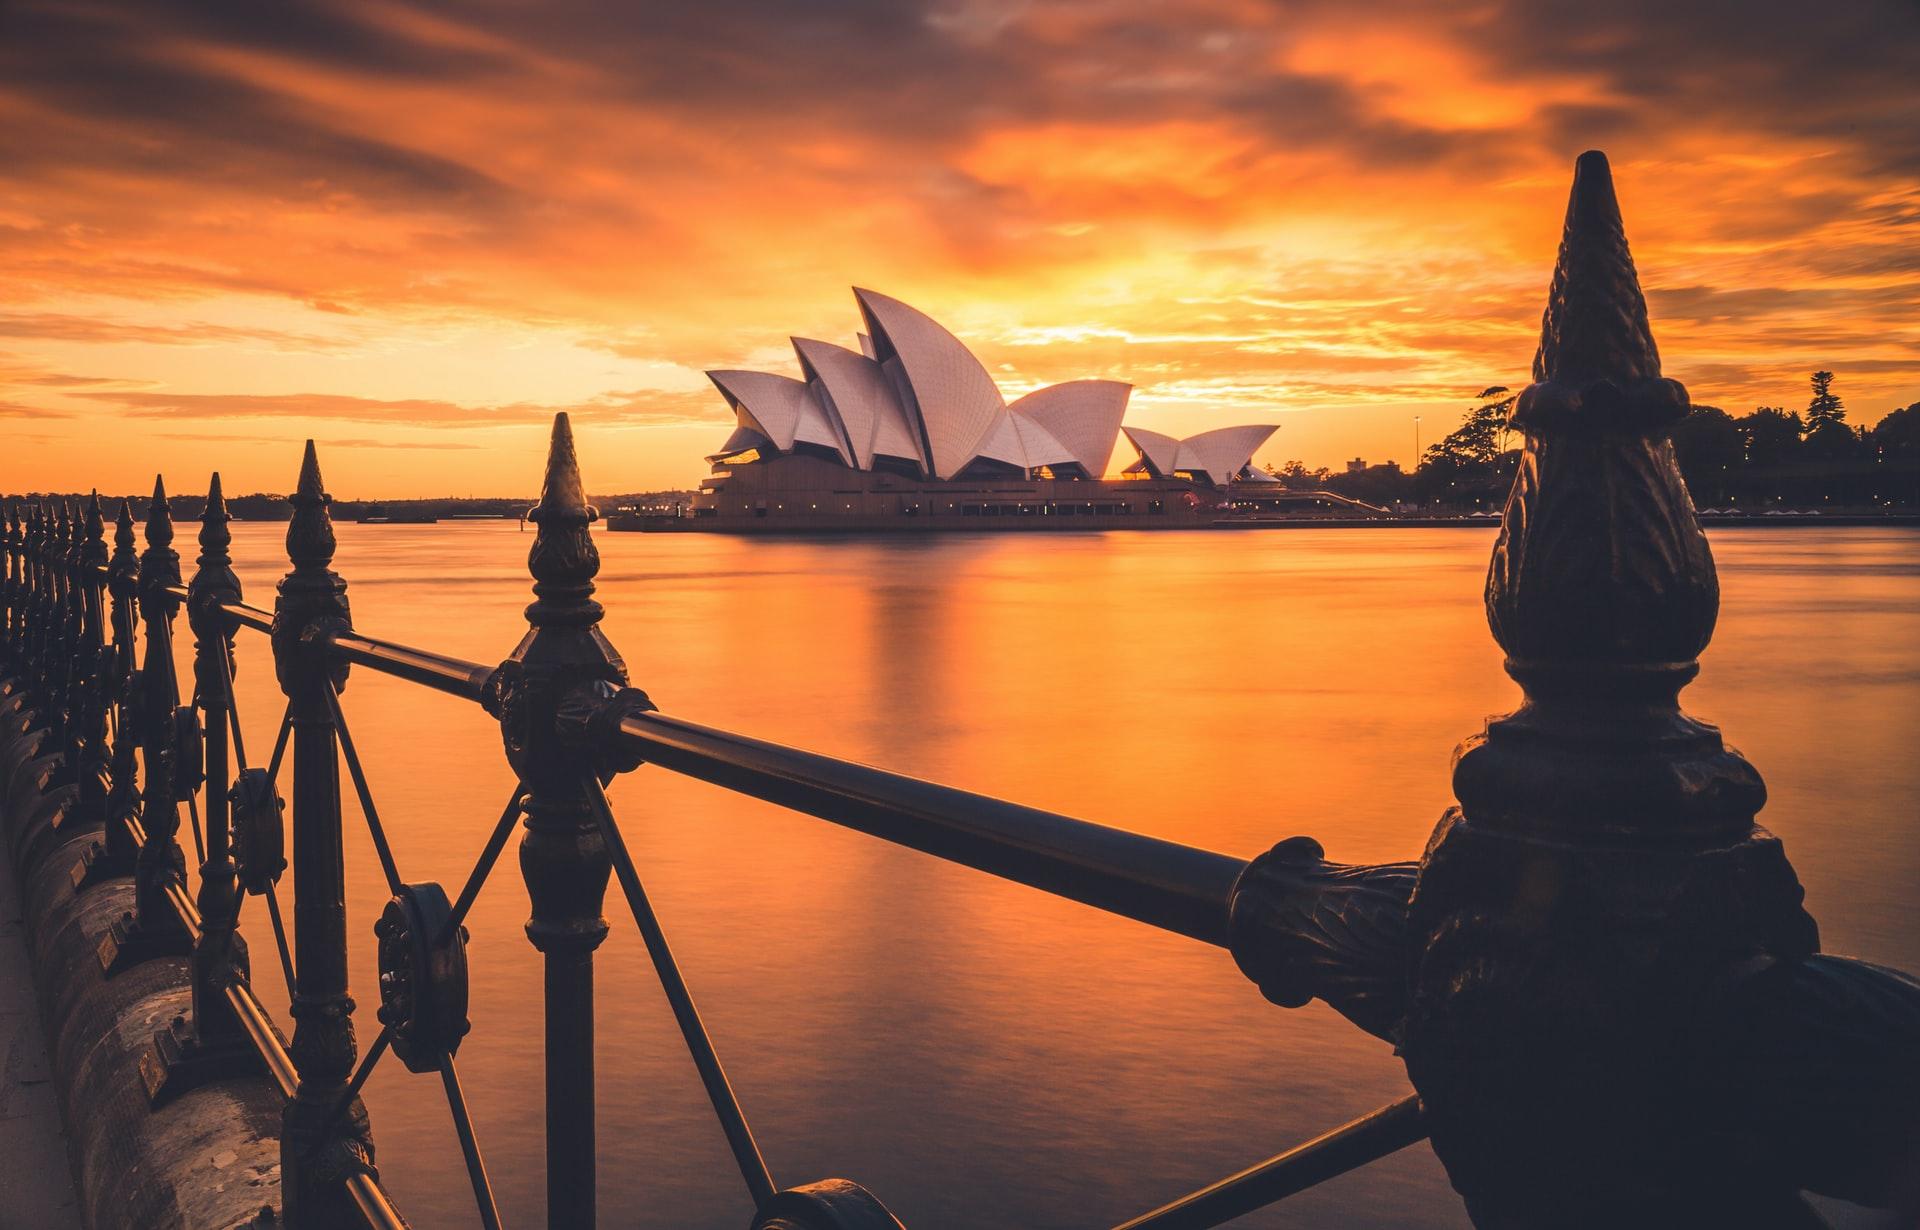 Epic Sydney, Scenery and Shiraz Tour